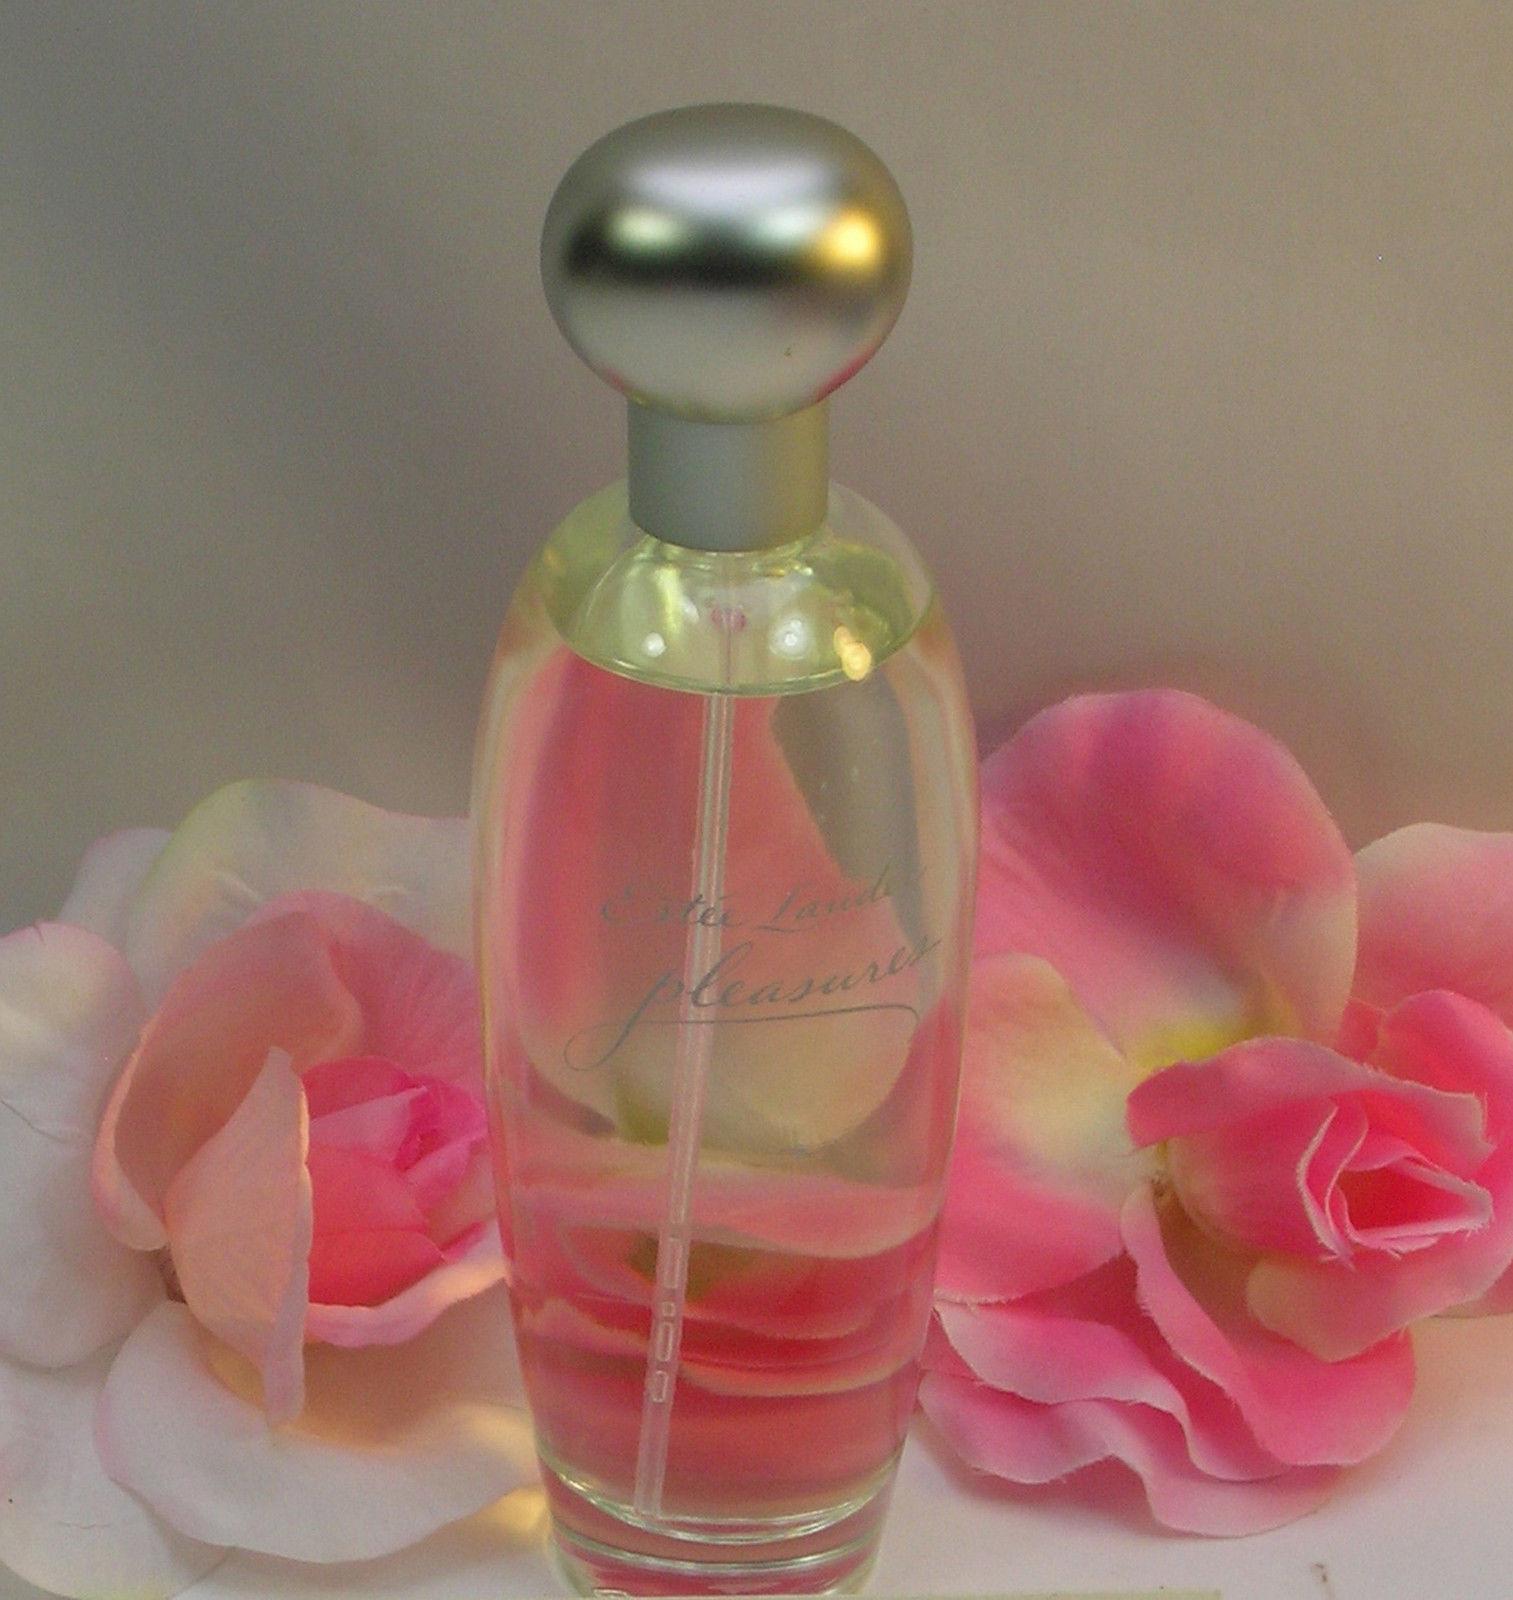 New Estee Lauder Pleasures Eau De Parfume And Similar Items Intense For Women Edp 100ml S L1600 34 Oz 100 Ml Perfume Full Size